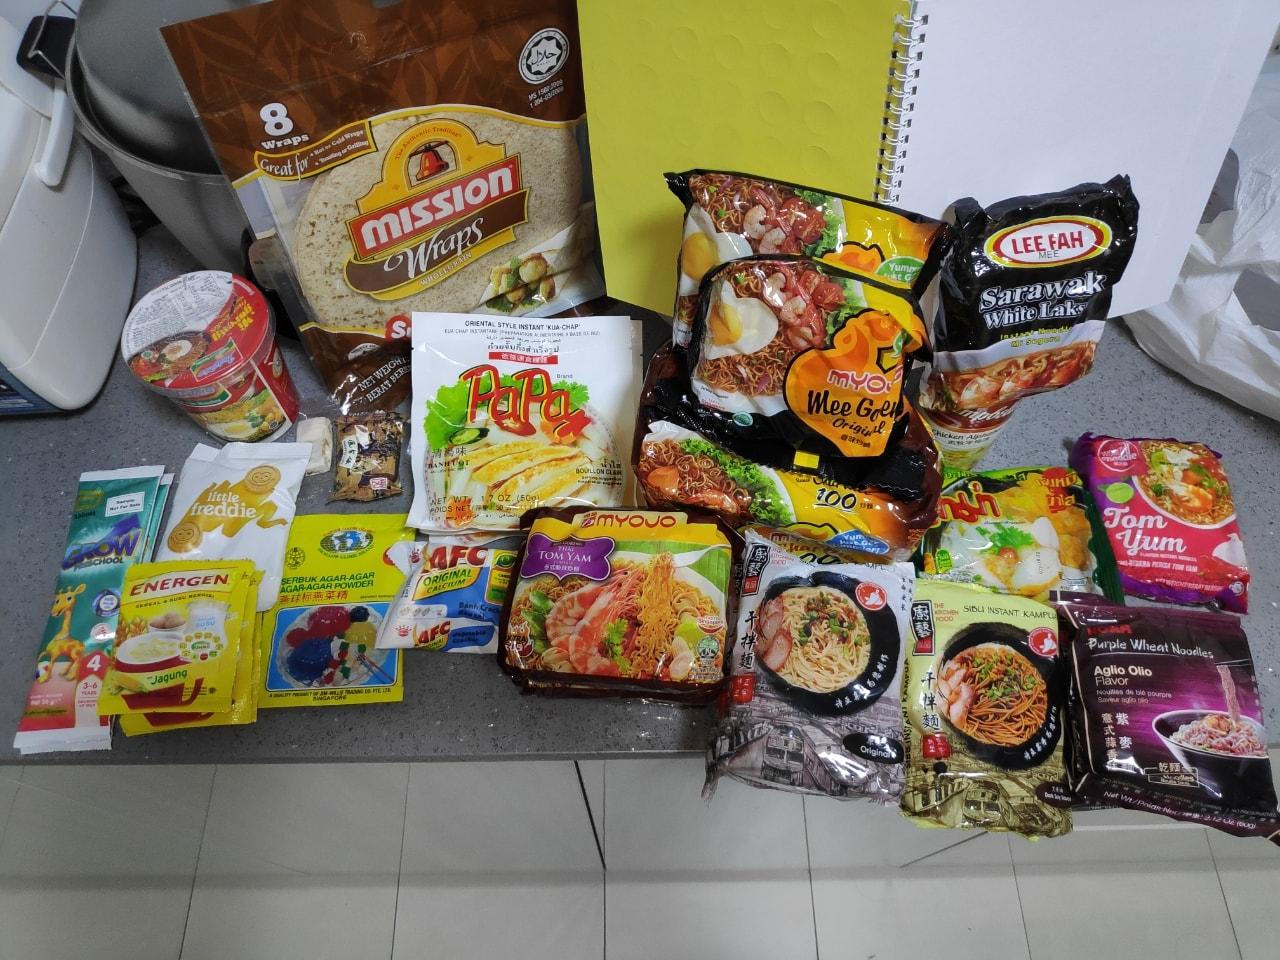 Instant noodles, oats, agar agar powder, wraps